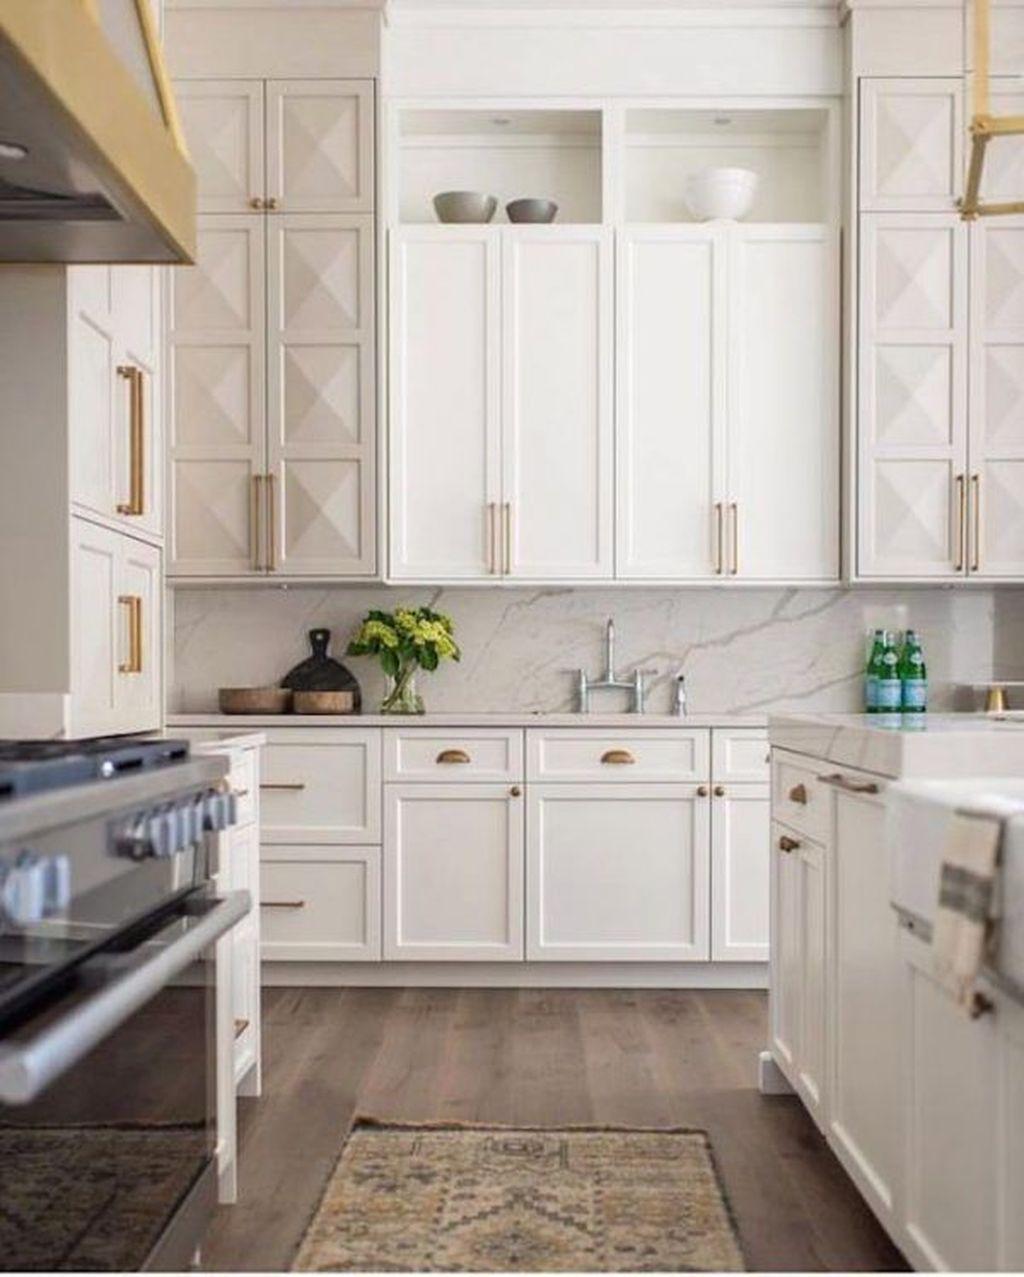 30 Classy Kitchen Decorating Ideas To Try This Year Kitchen Cabinet Design Kitchen Design Trends Kitchen Renovation